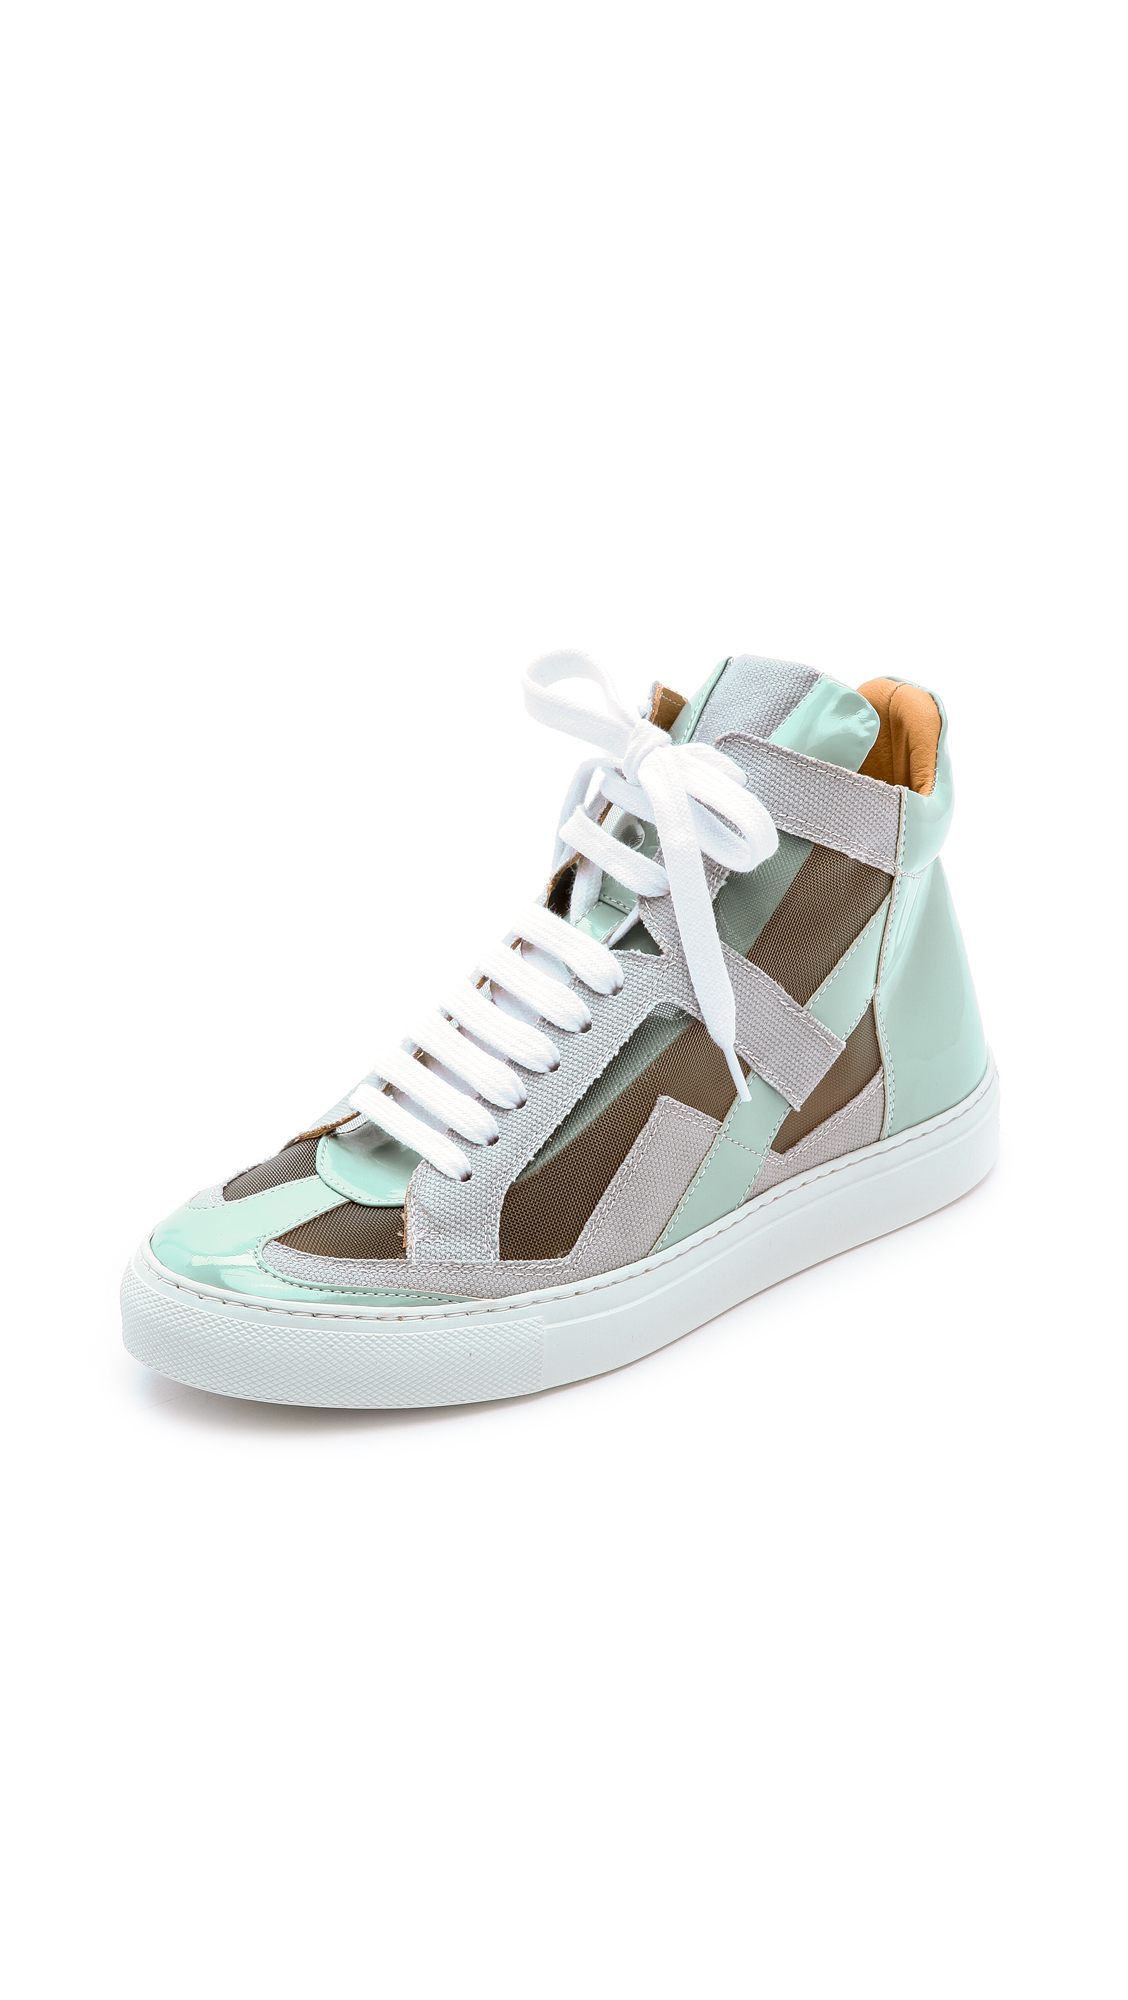 sale ebay sale Cheapest Maison Martin Margiela Mesh-Trimmed High-Top Sneakers cheap Inexpensive YUDQ3txnOD